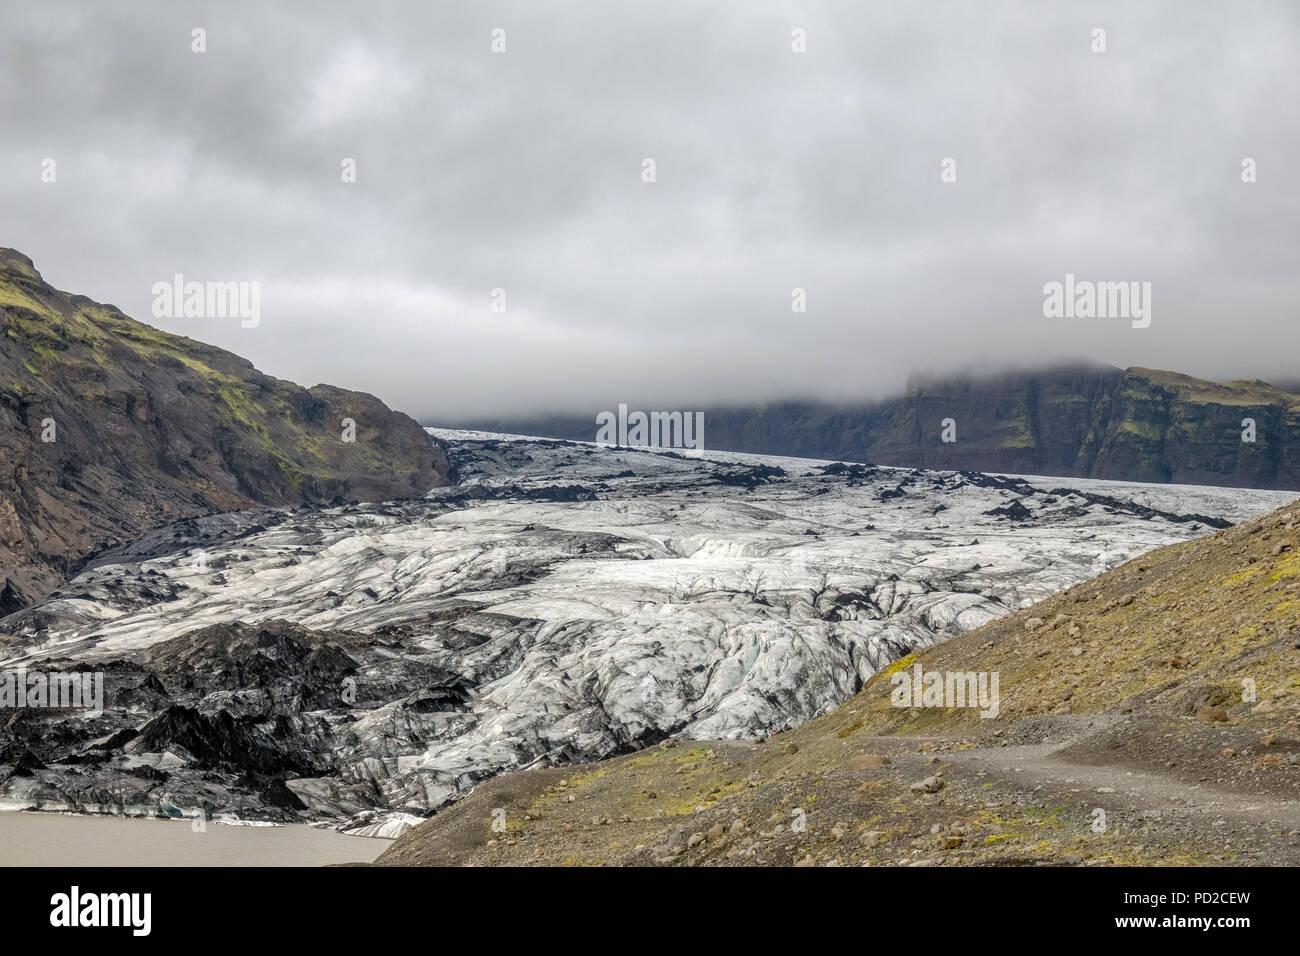 Solheimajokull is a glacier tounge of the Myrdalsjokull glacier in southern Iceland - Stock Image